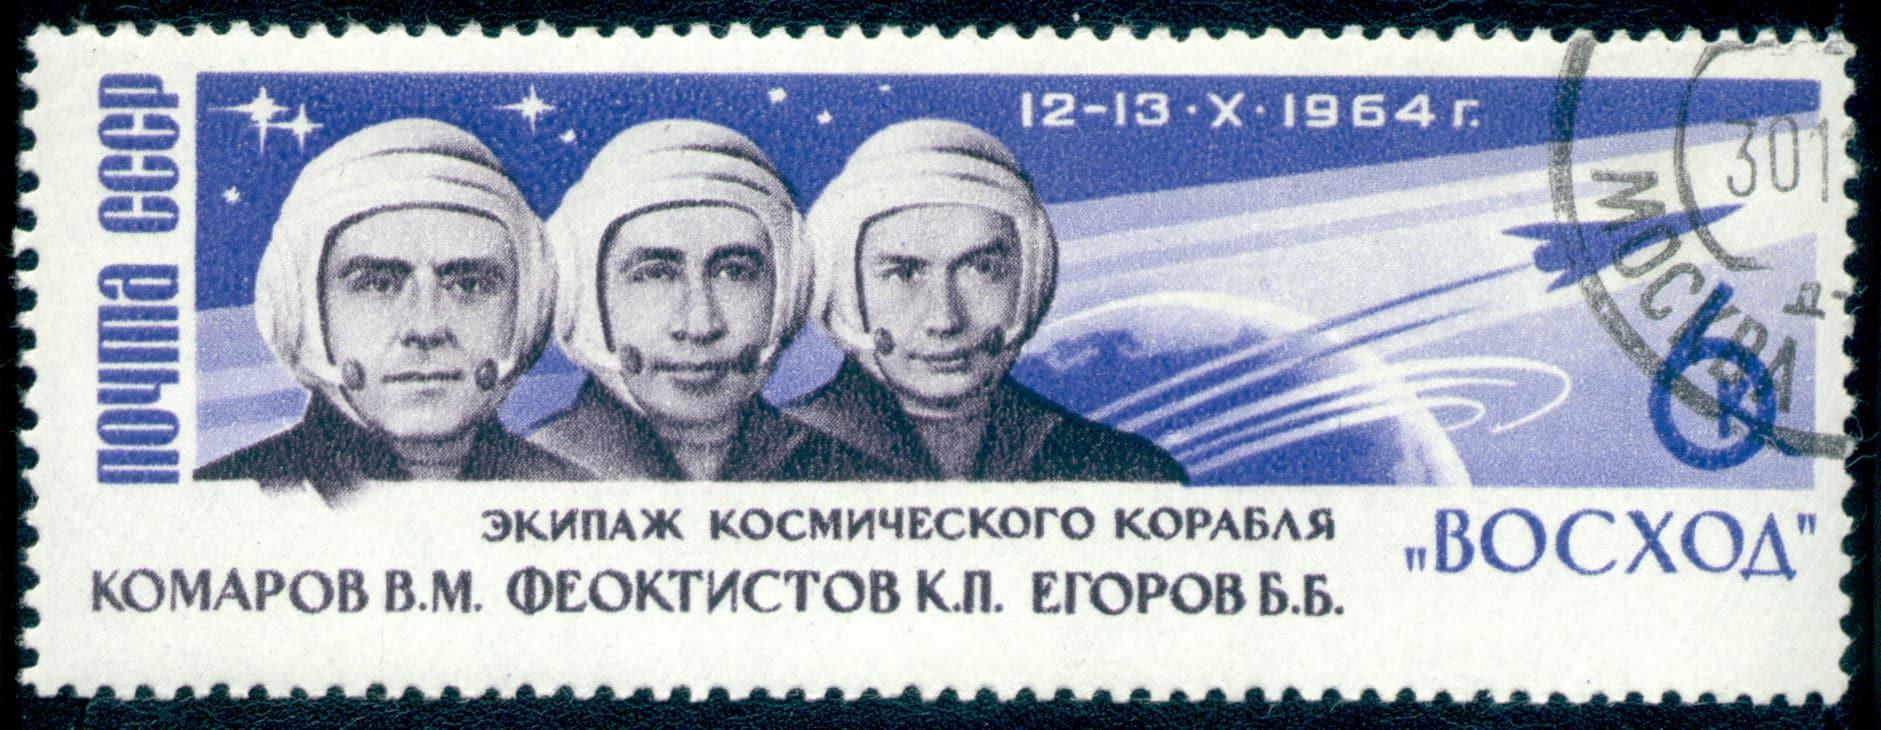 СССР, 1964 год